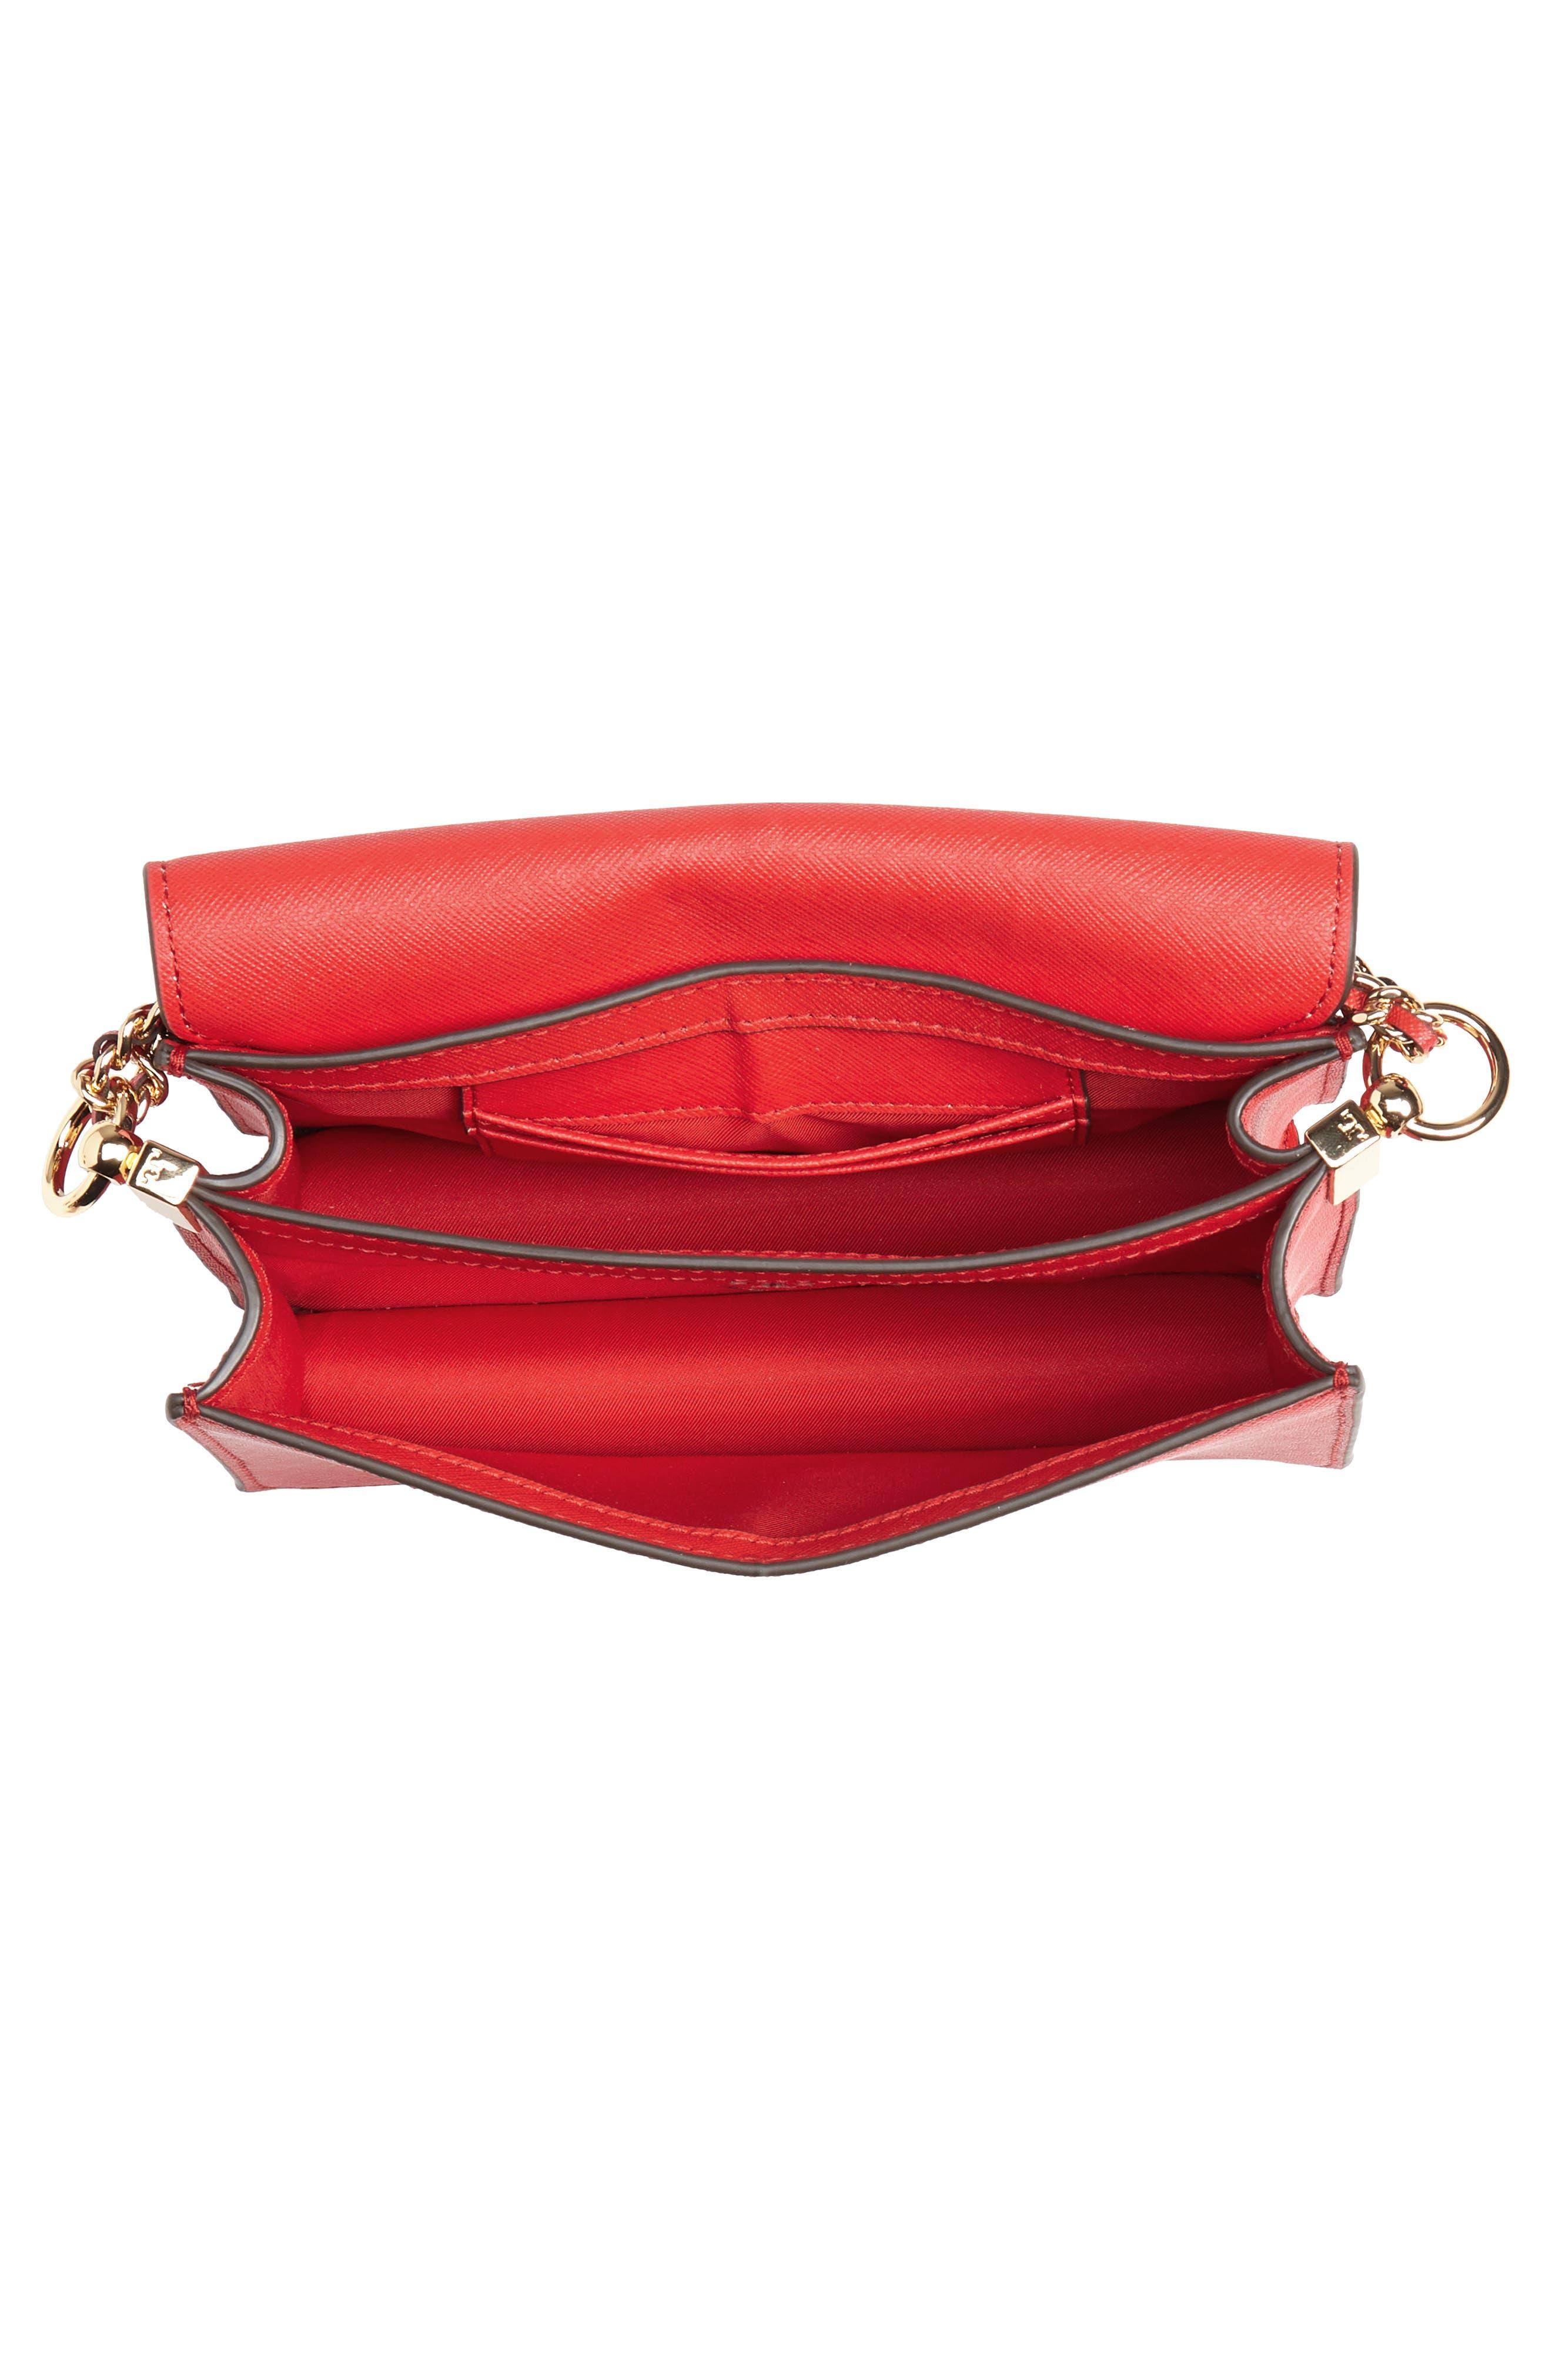 Mini Robinson Convertible Leather Shoulder Bag,                             Alternate thumbnail 4, color,                             BRILLIANT RED